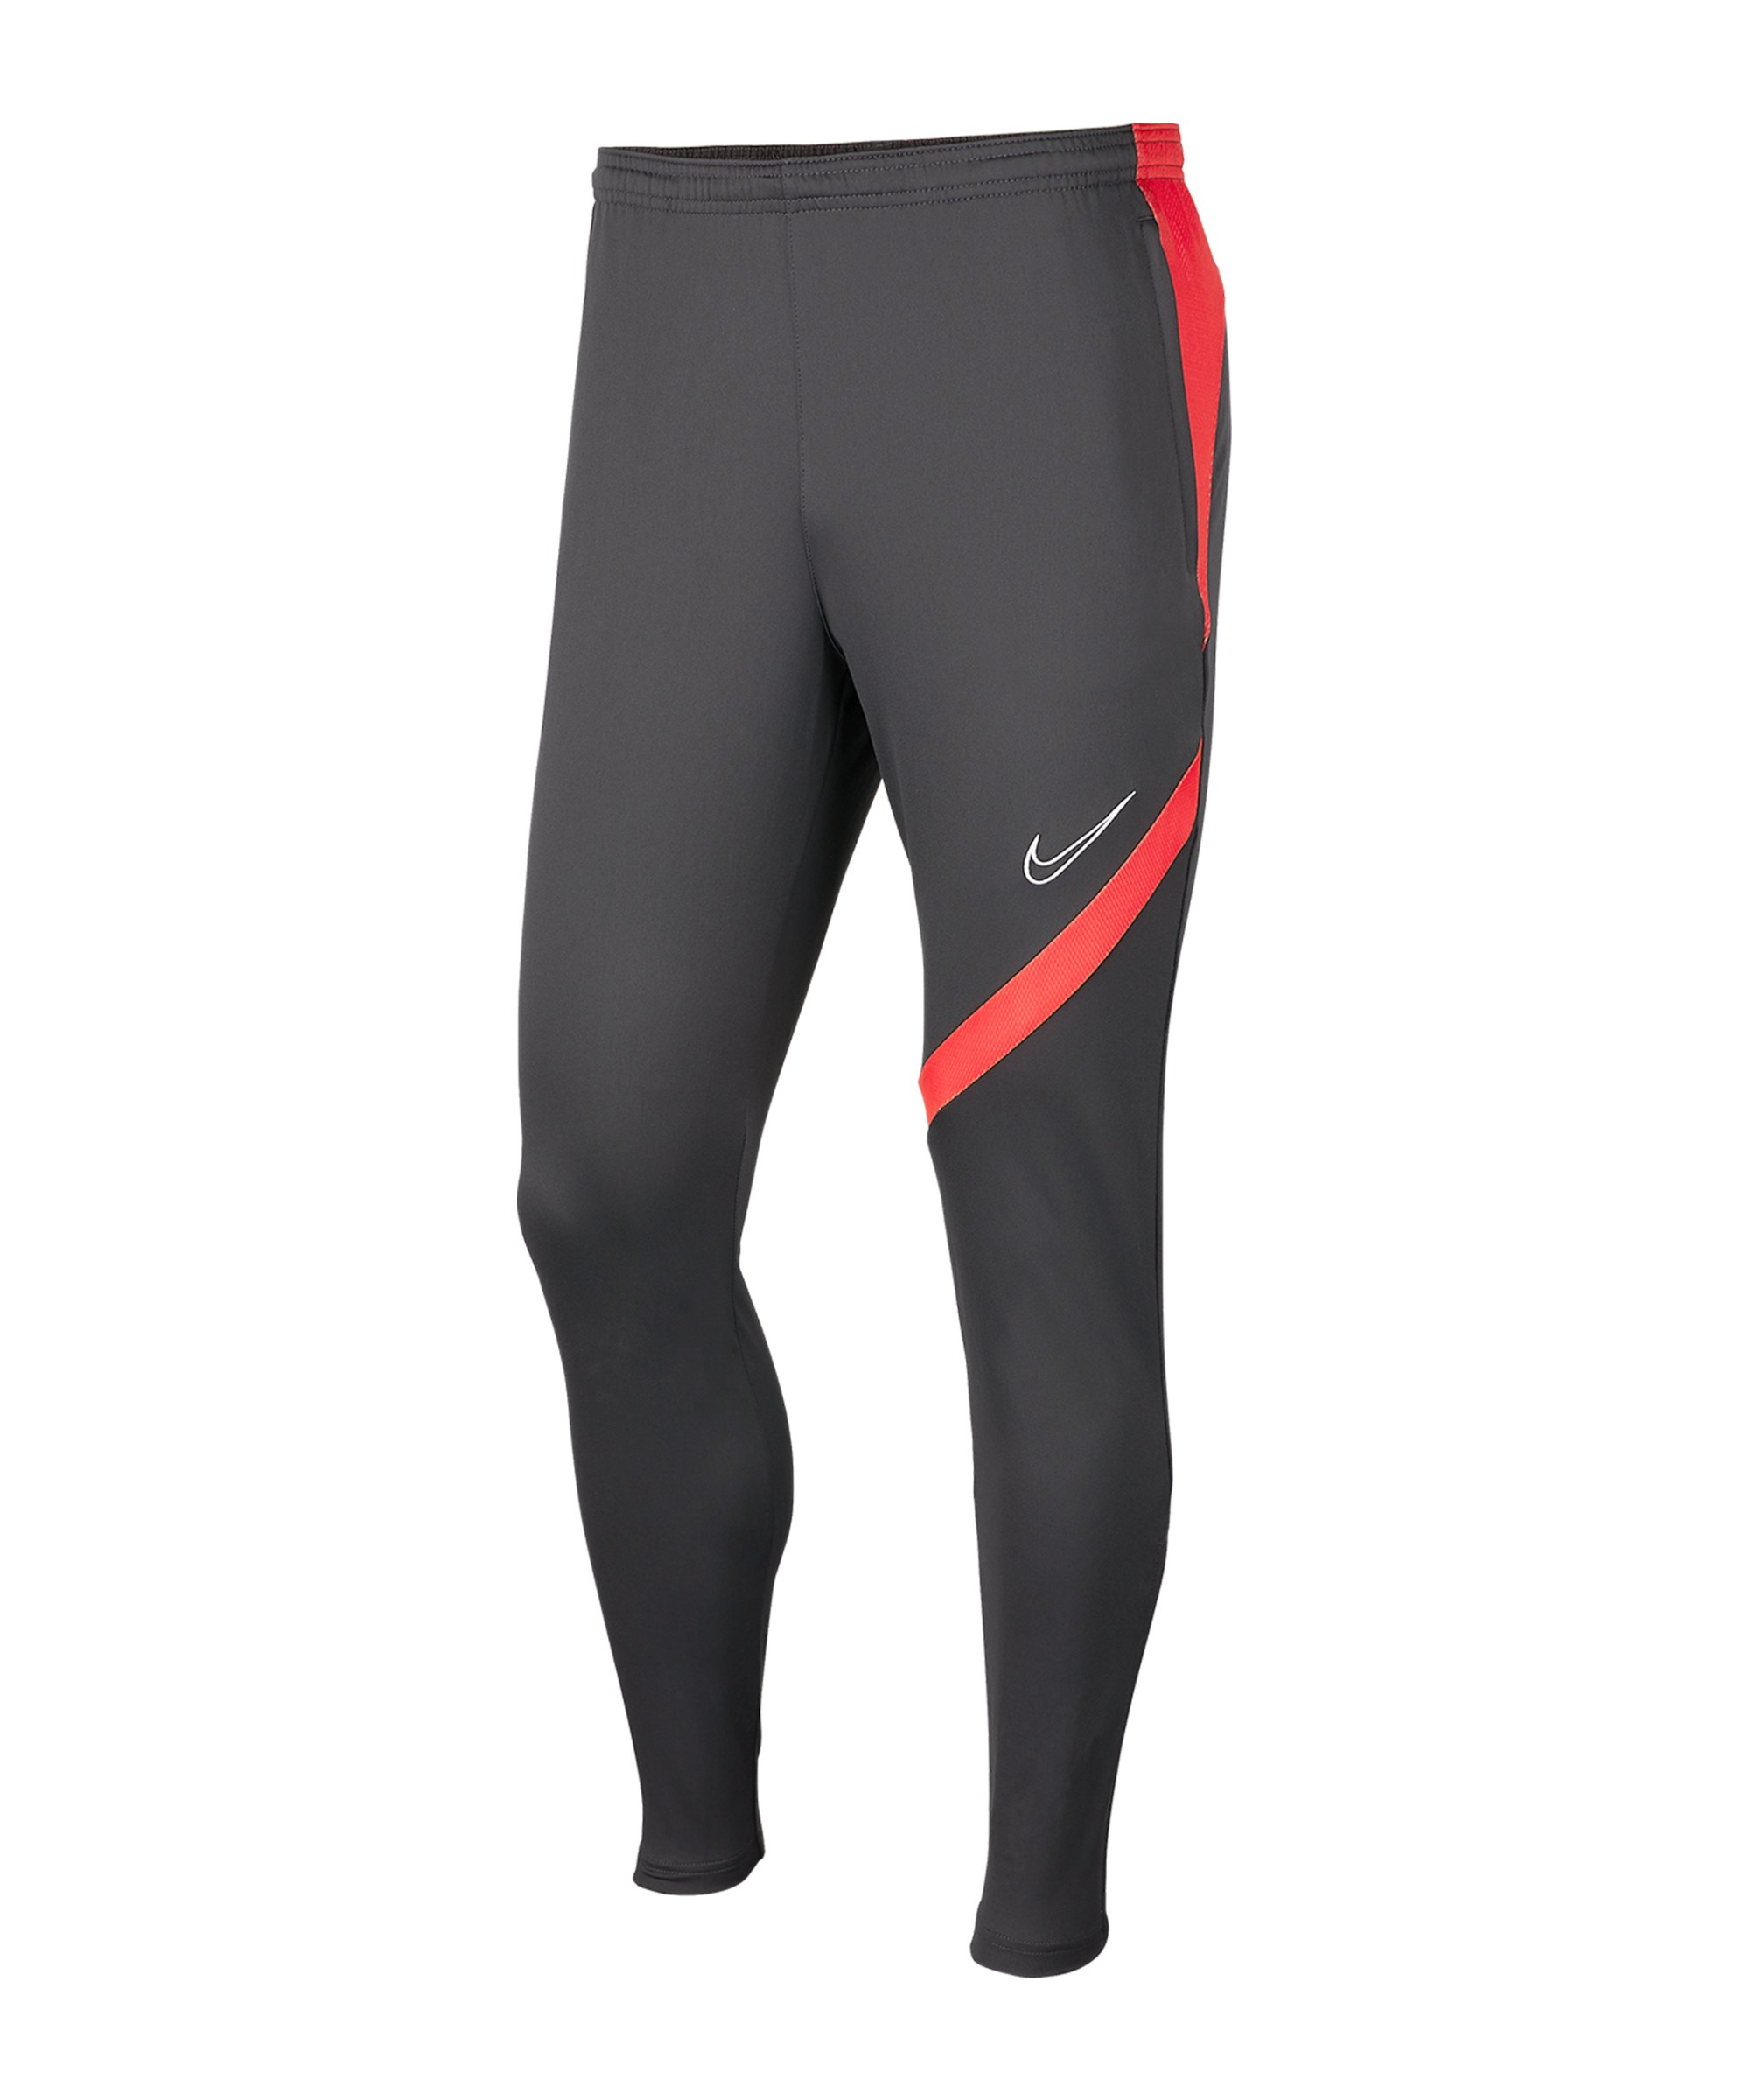 Nike Academy Pro Trainingshose Grau Rot F070 - grau